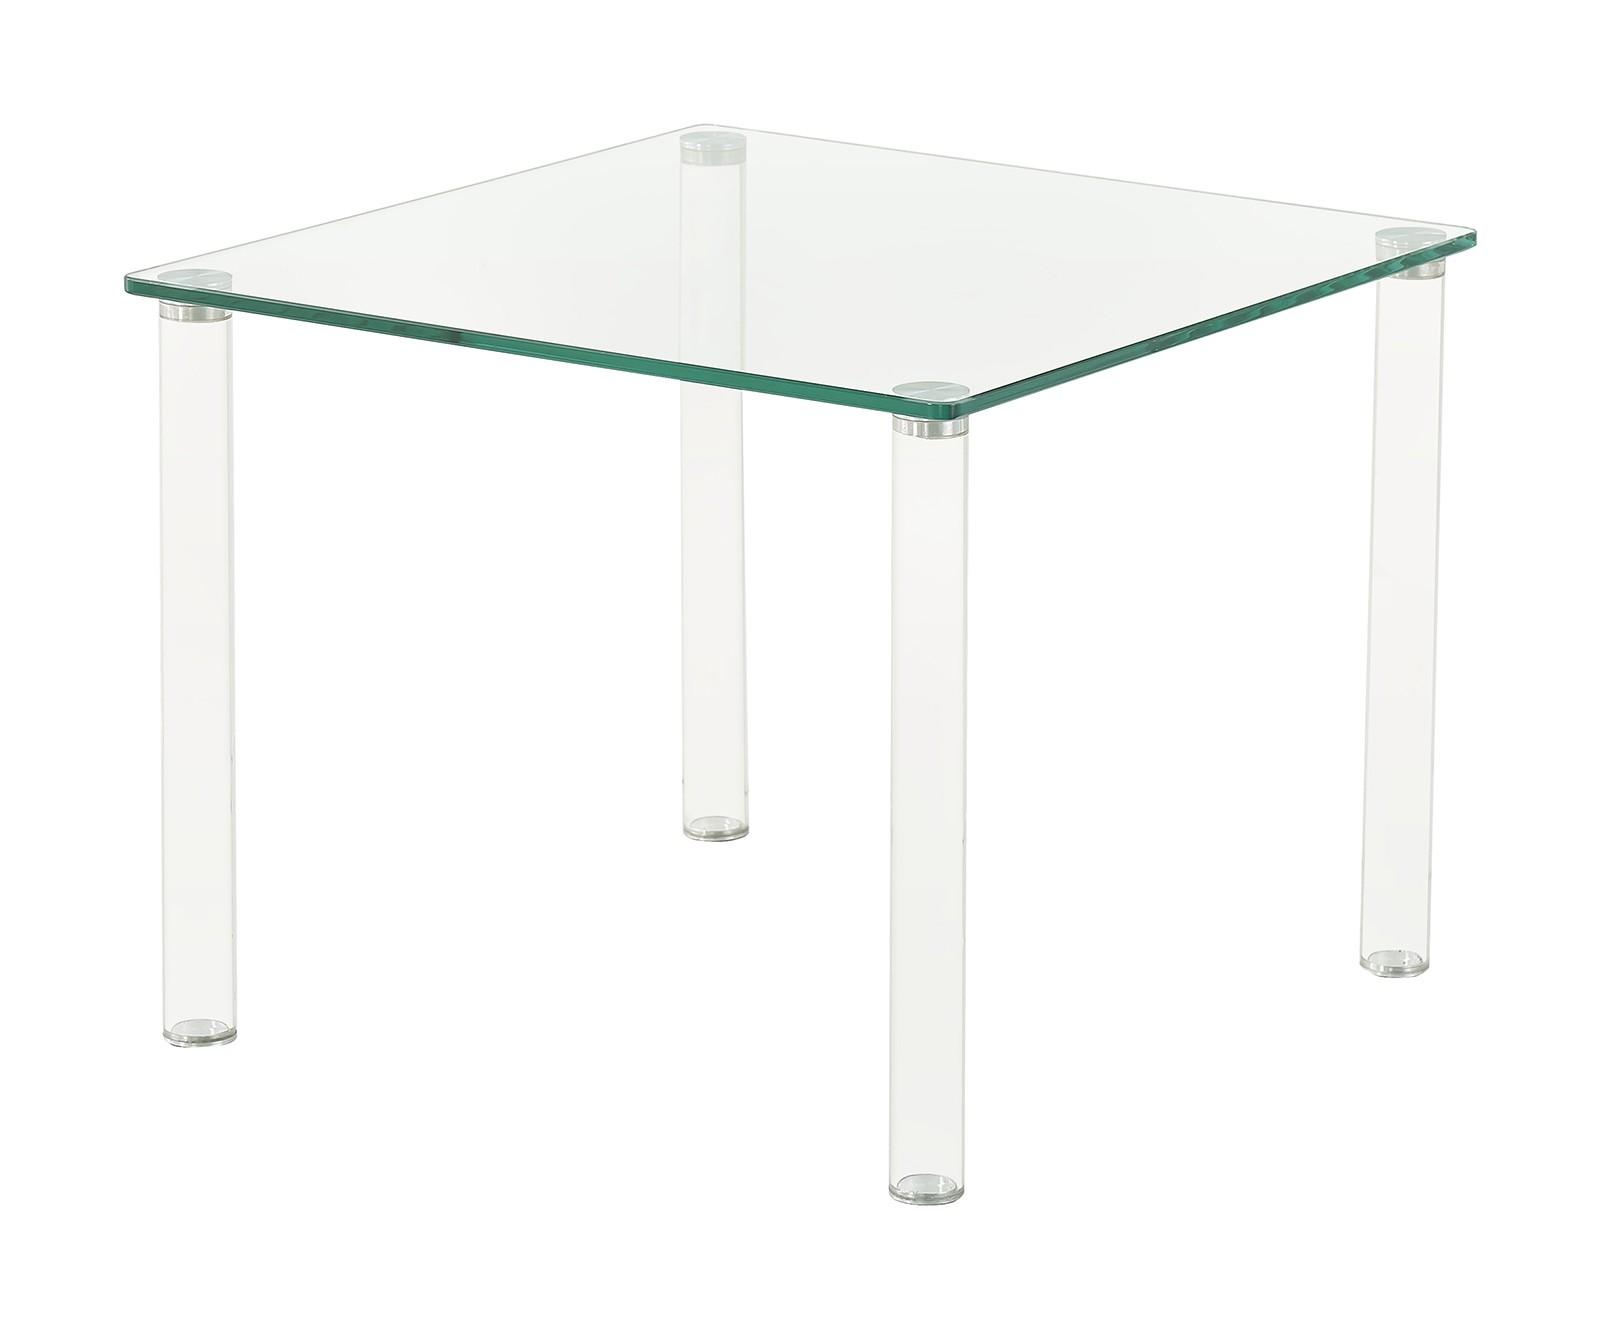 Glacier Modern Glass and Tube Leg Design Side Table